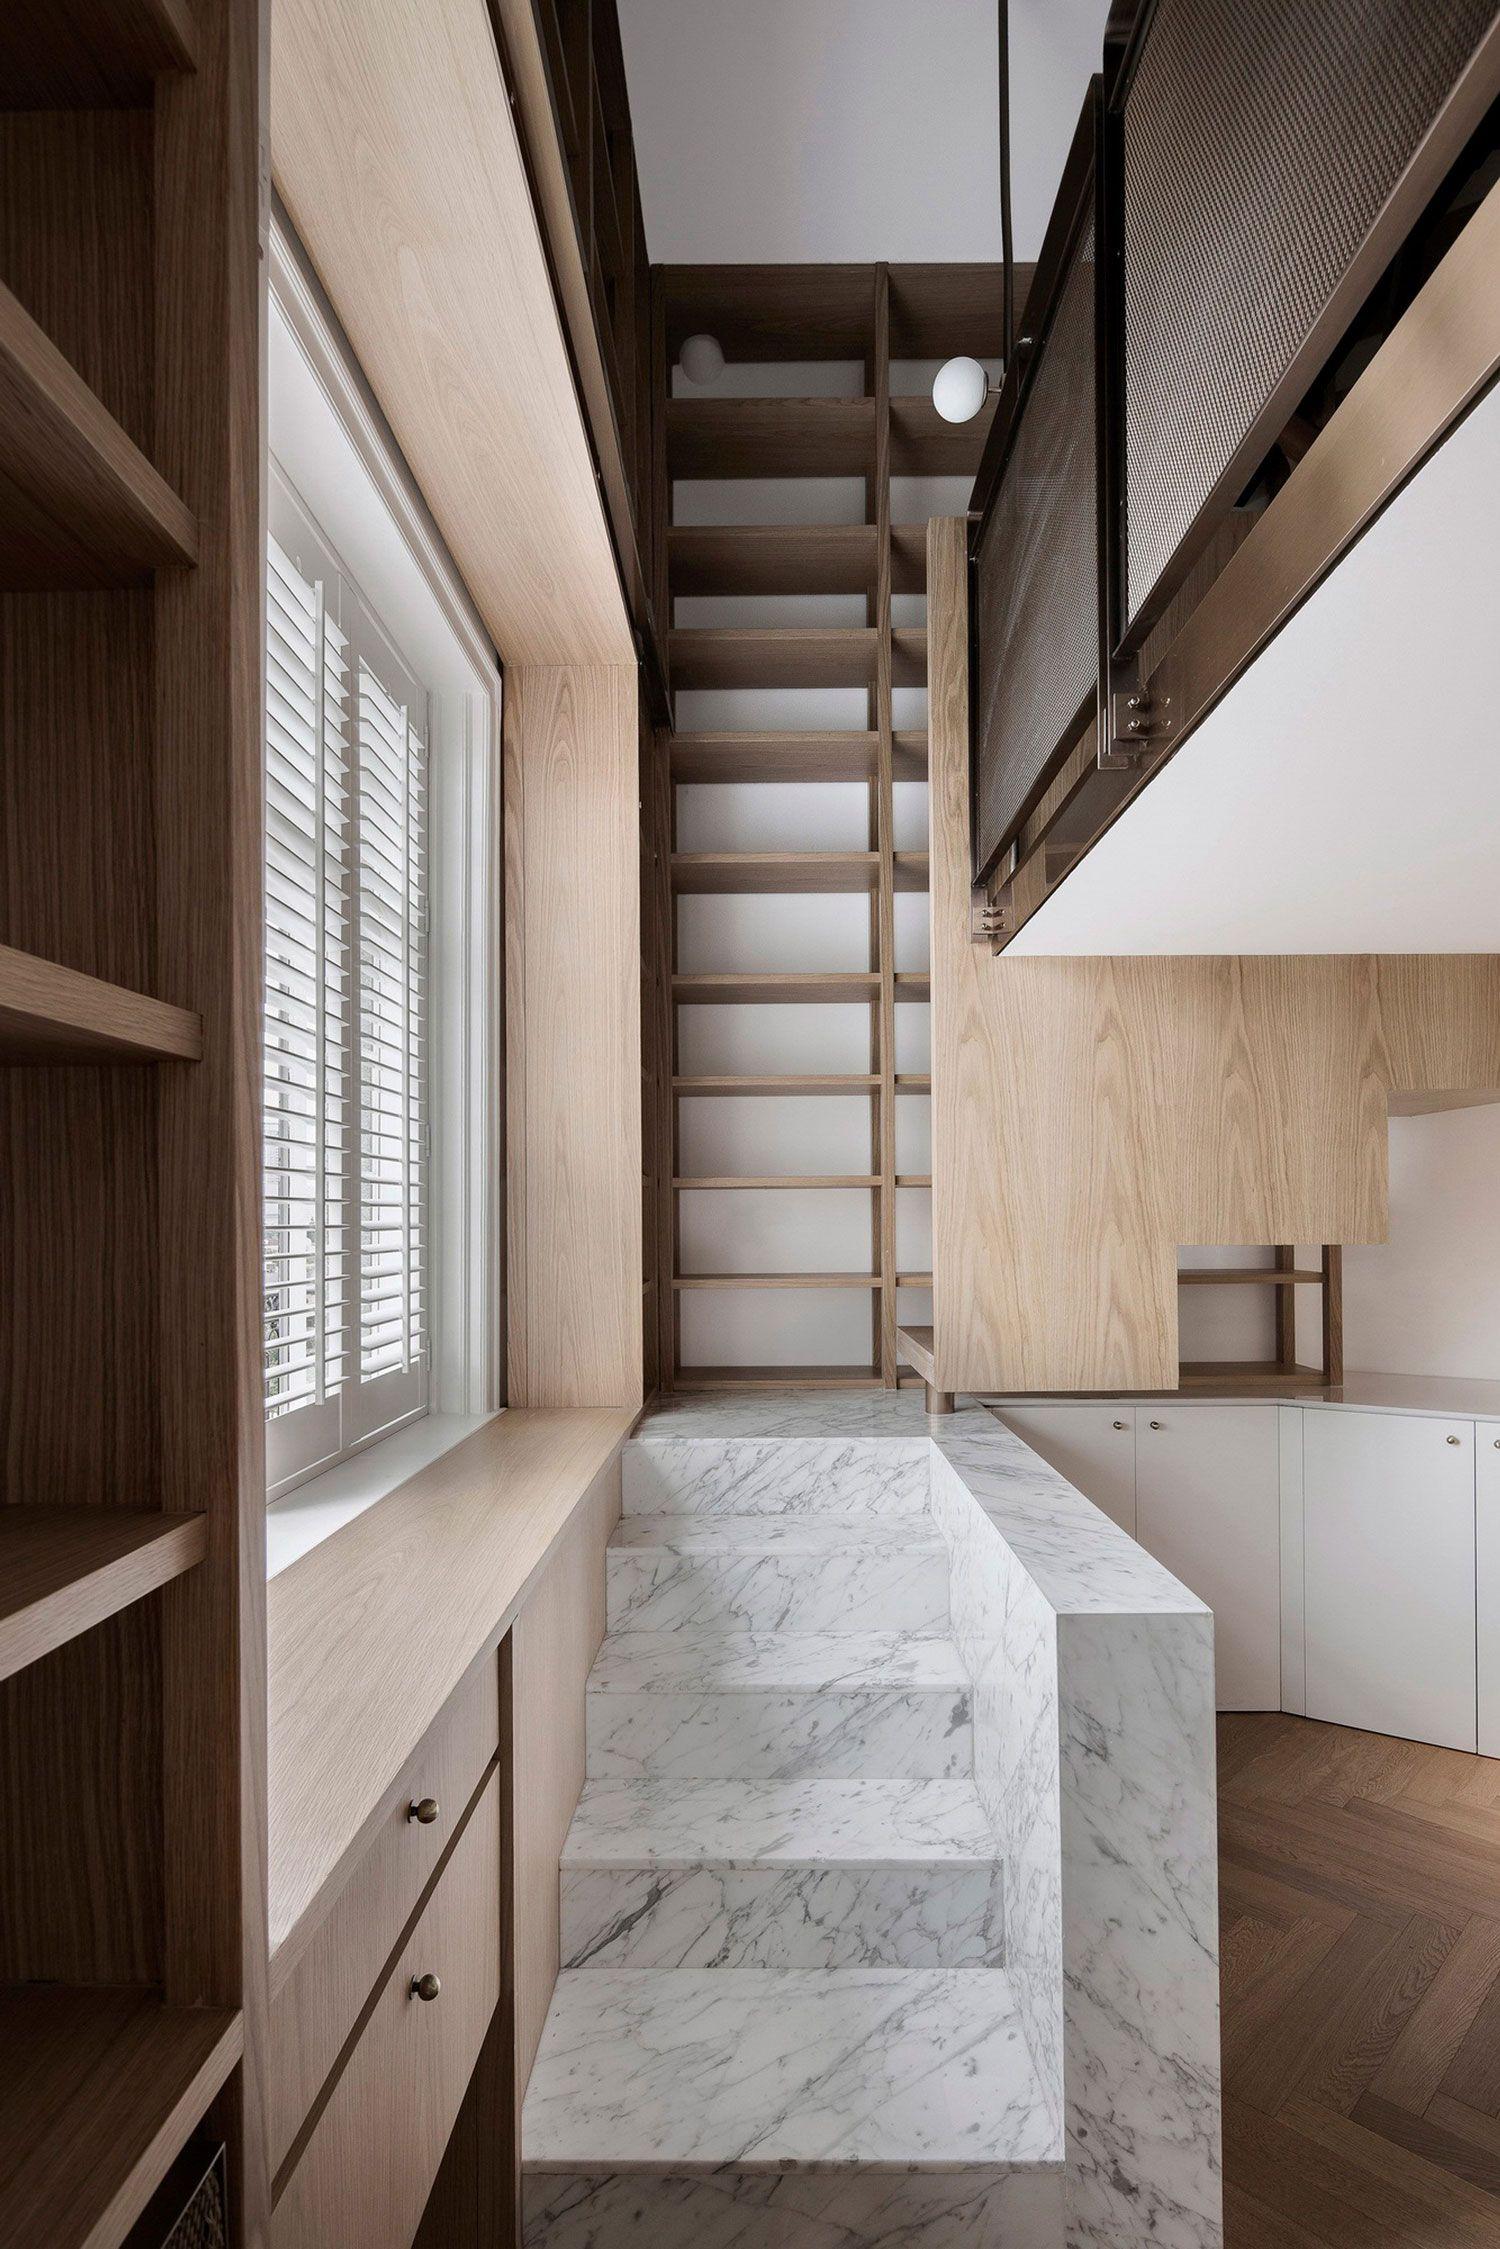 com comfortable to building redaktif ceiling bookshelves floor